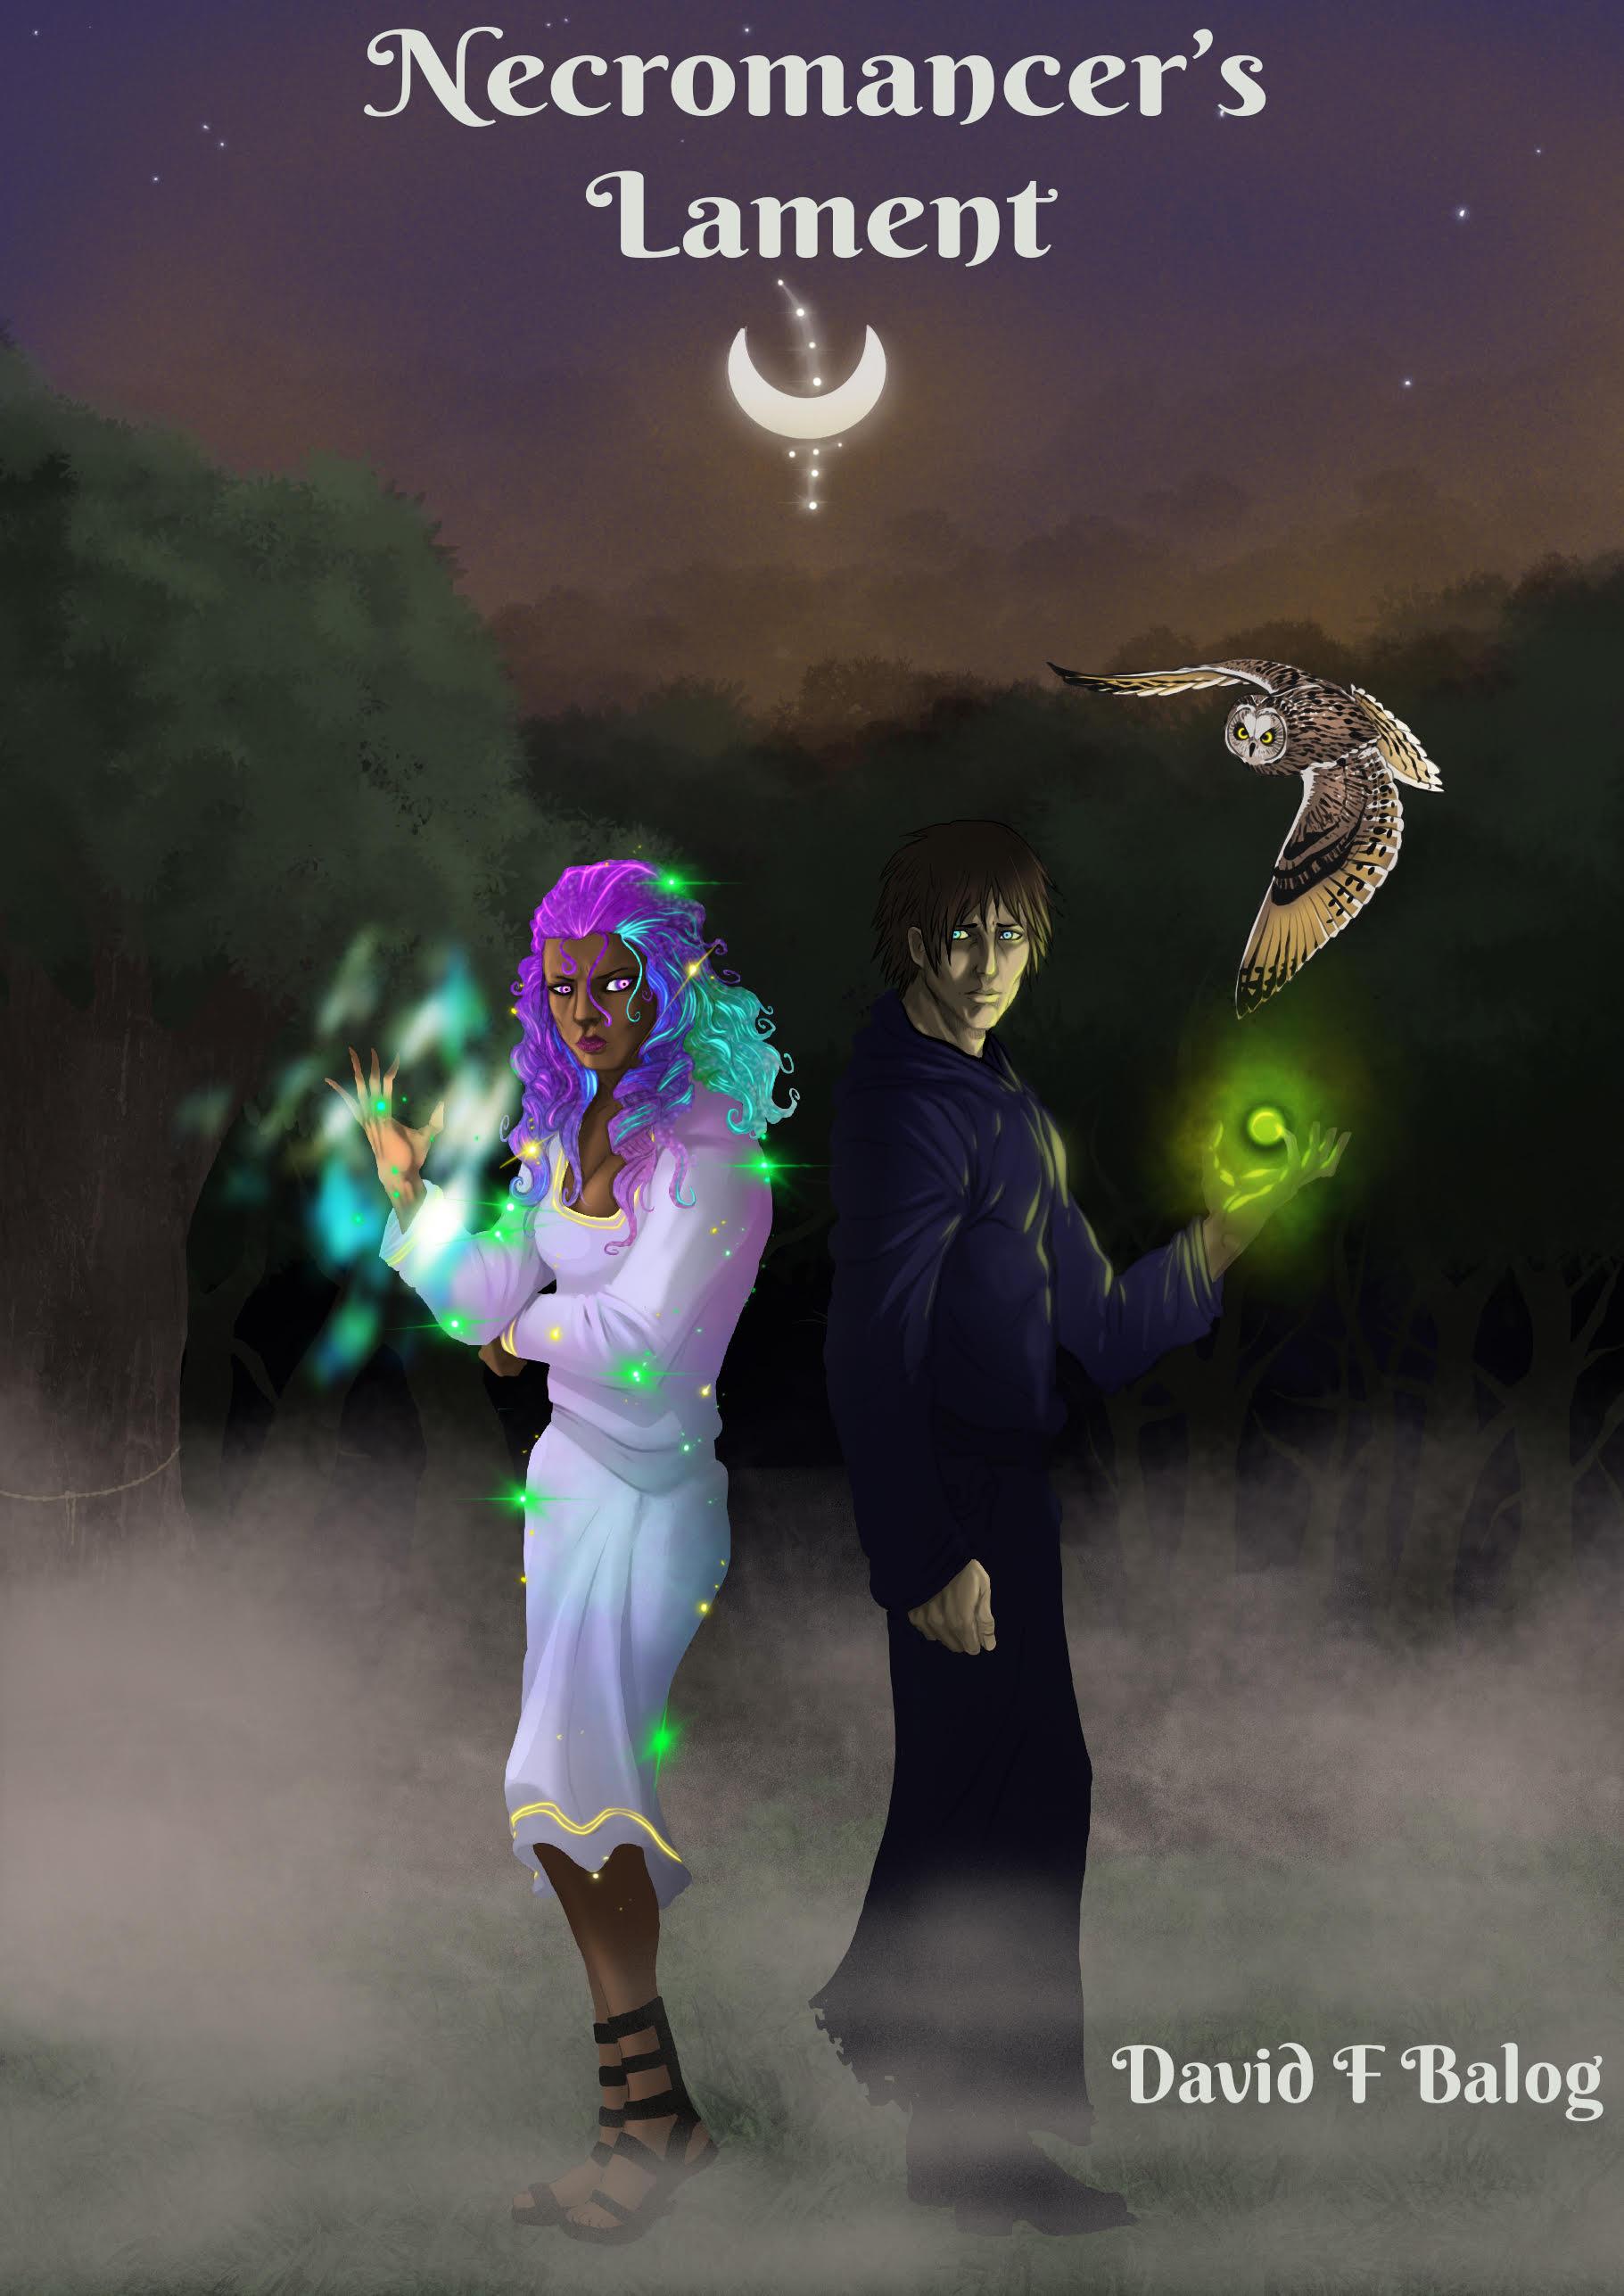 Cover of Necromancer's lament fantasy book by david balog